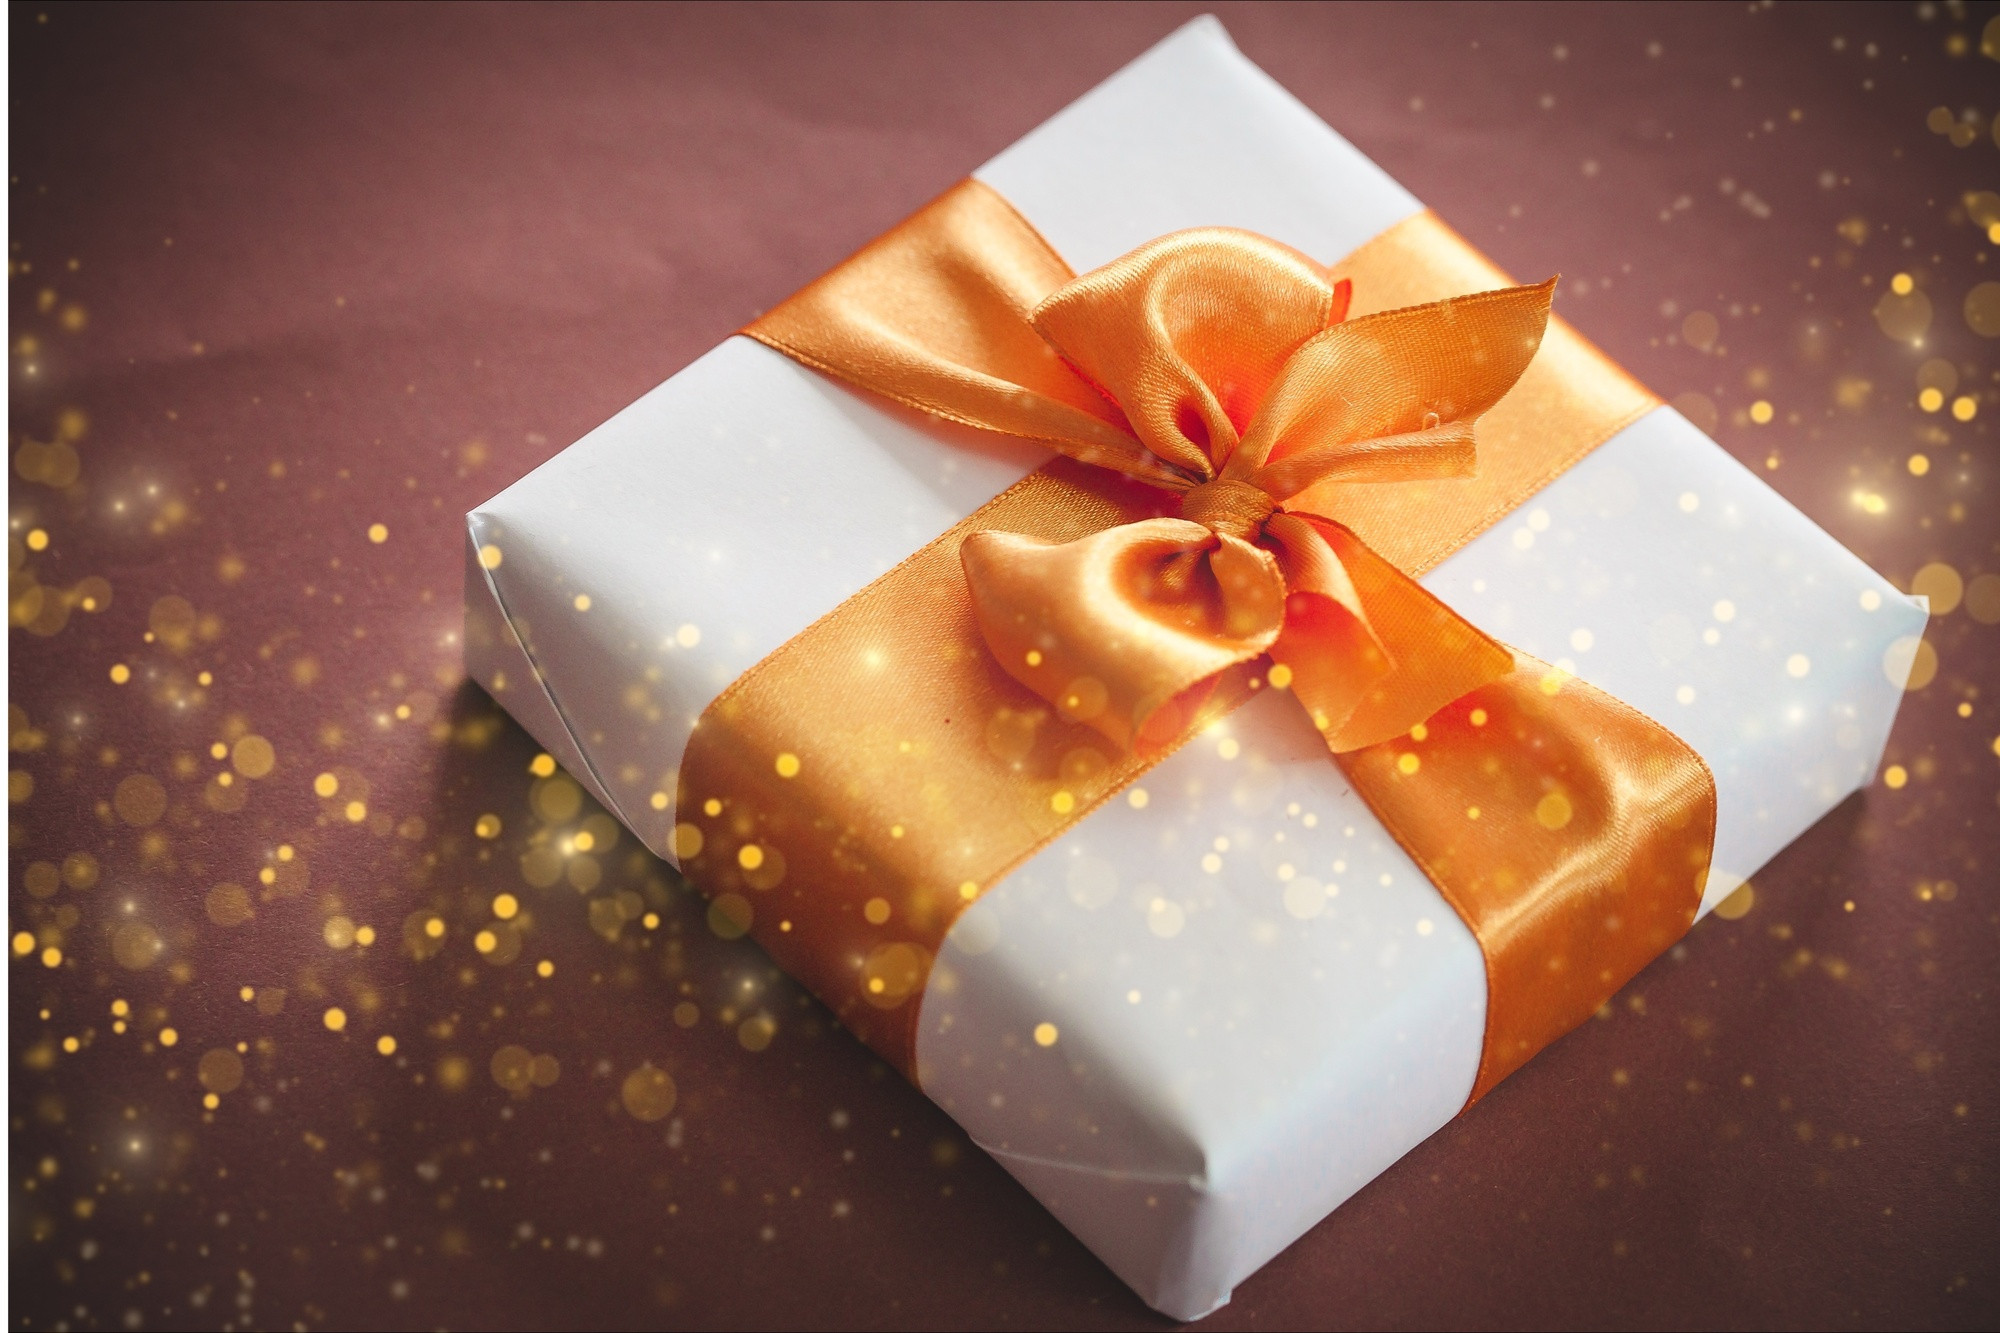 Creative Gift Ideas For Couples  10 Unique Wedding Gift Ideas for Couples Who Have